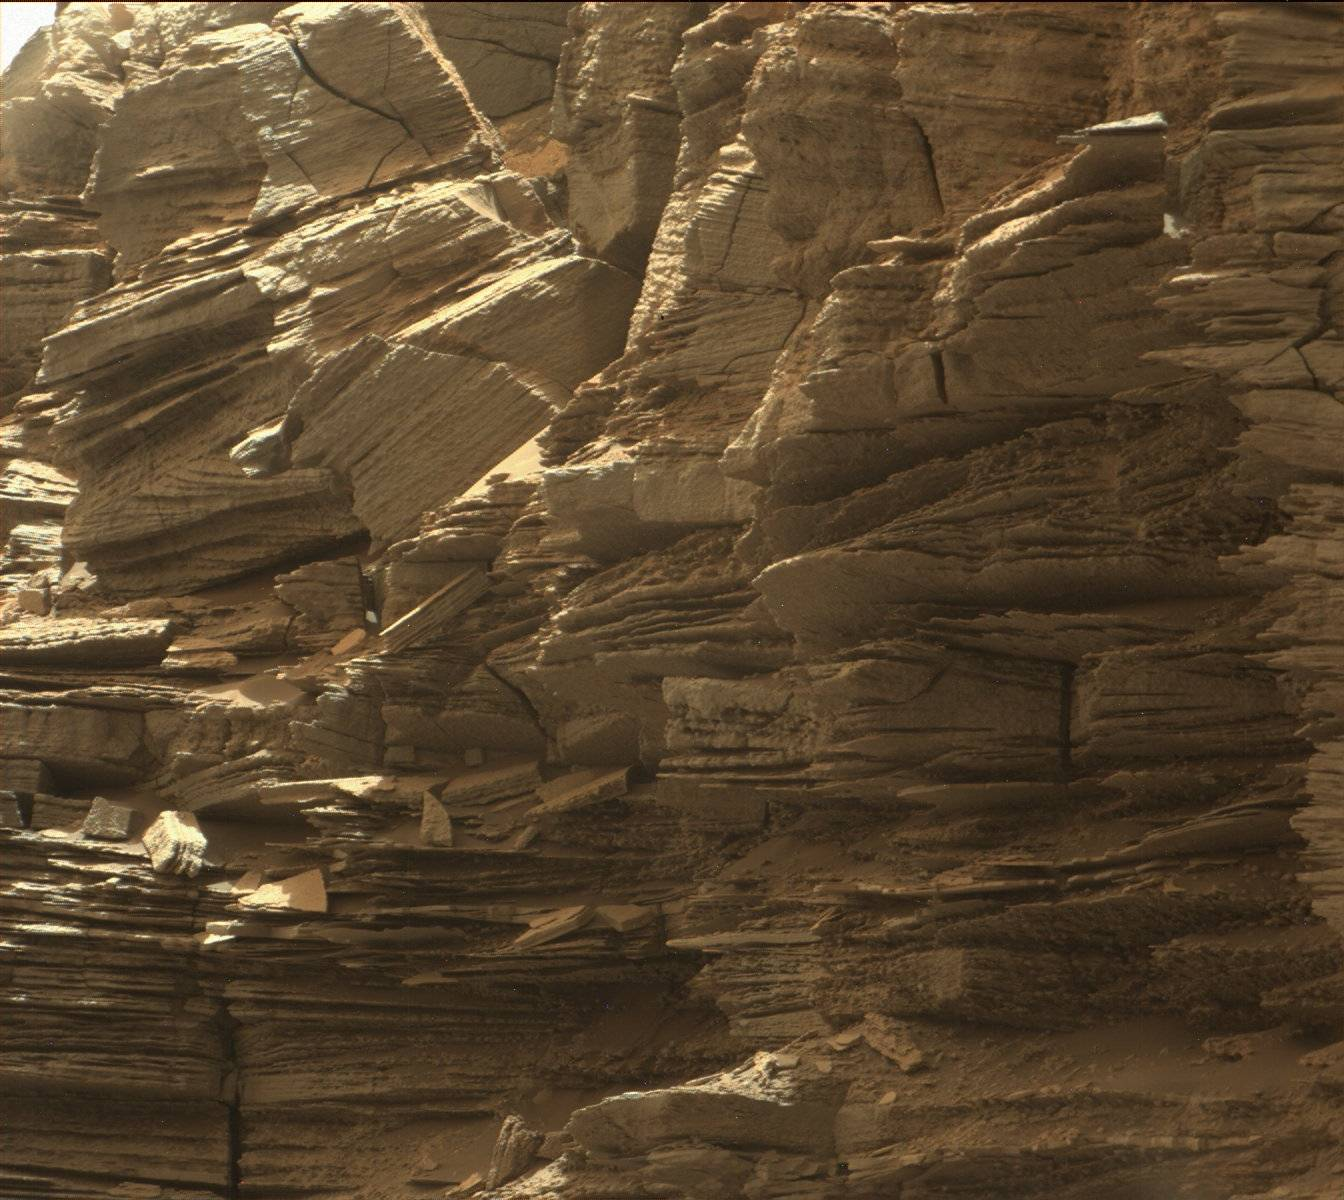 mars rover twitter - photo #25